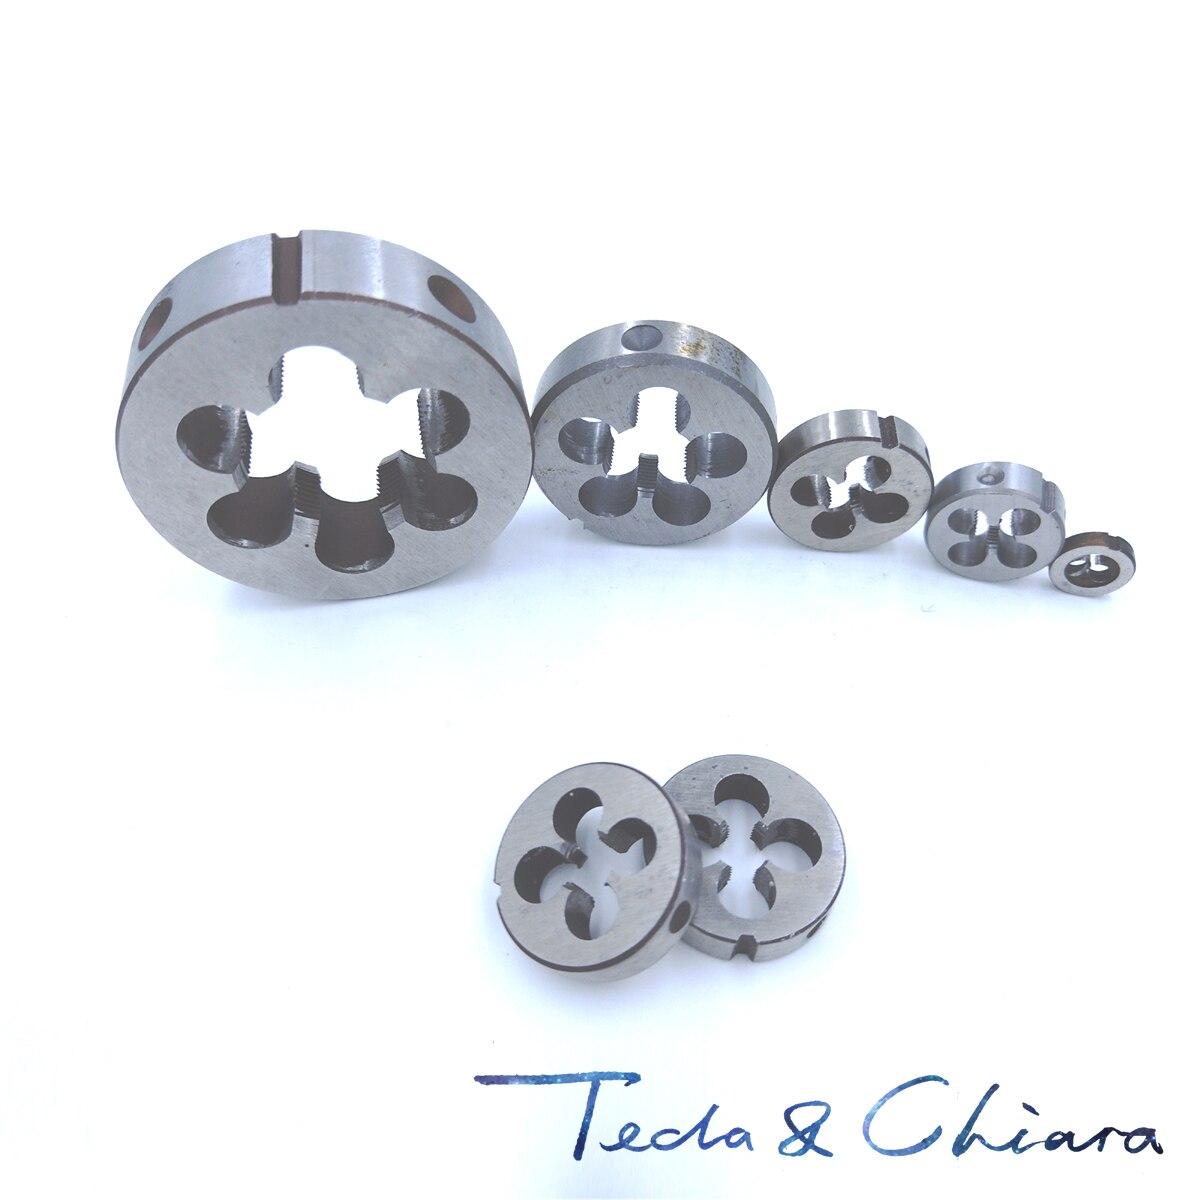 1Pc M18 X 0.75mm 1mm 1.25mm 1.5mm 1.75mm 2mm 2.5mm Metric Right Hand Die Threading Tools Mold Machining * 1 1.25 1.5 1.75 2 2.5